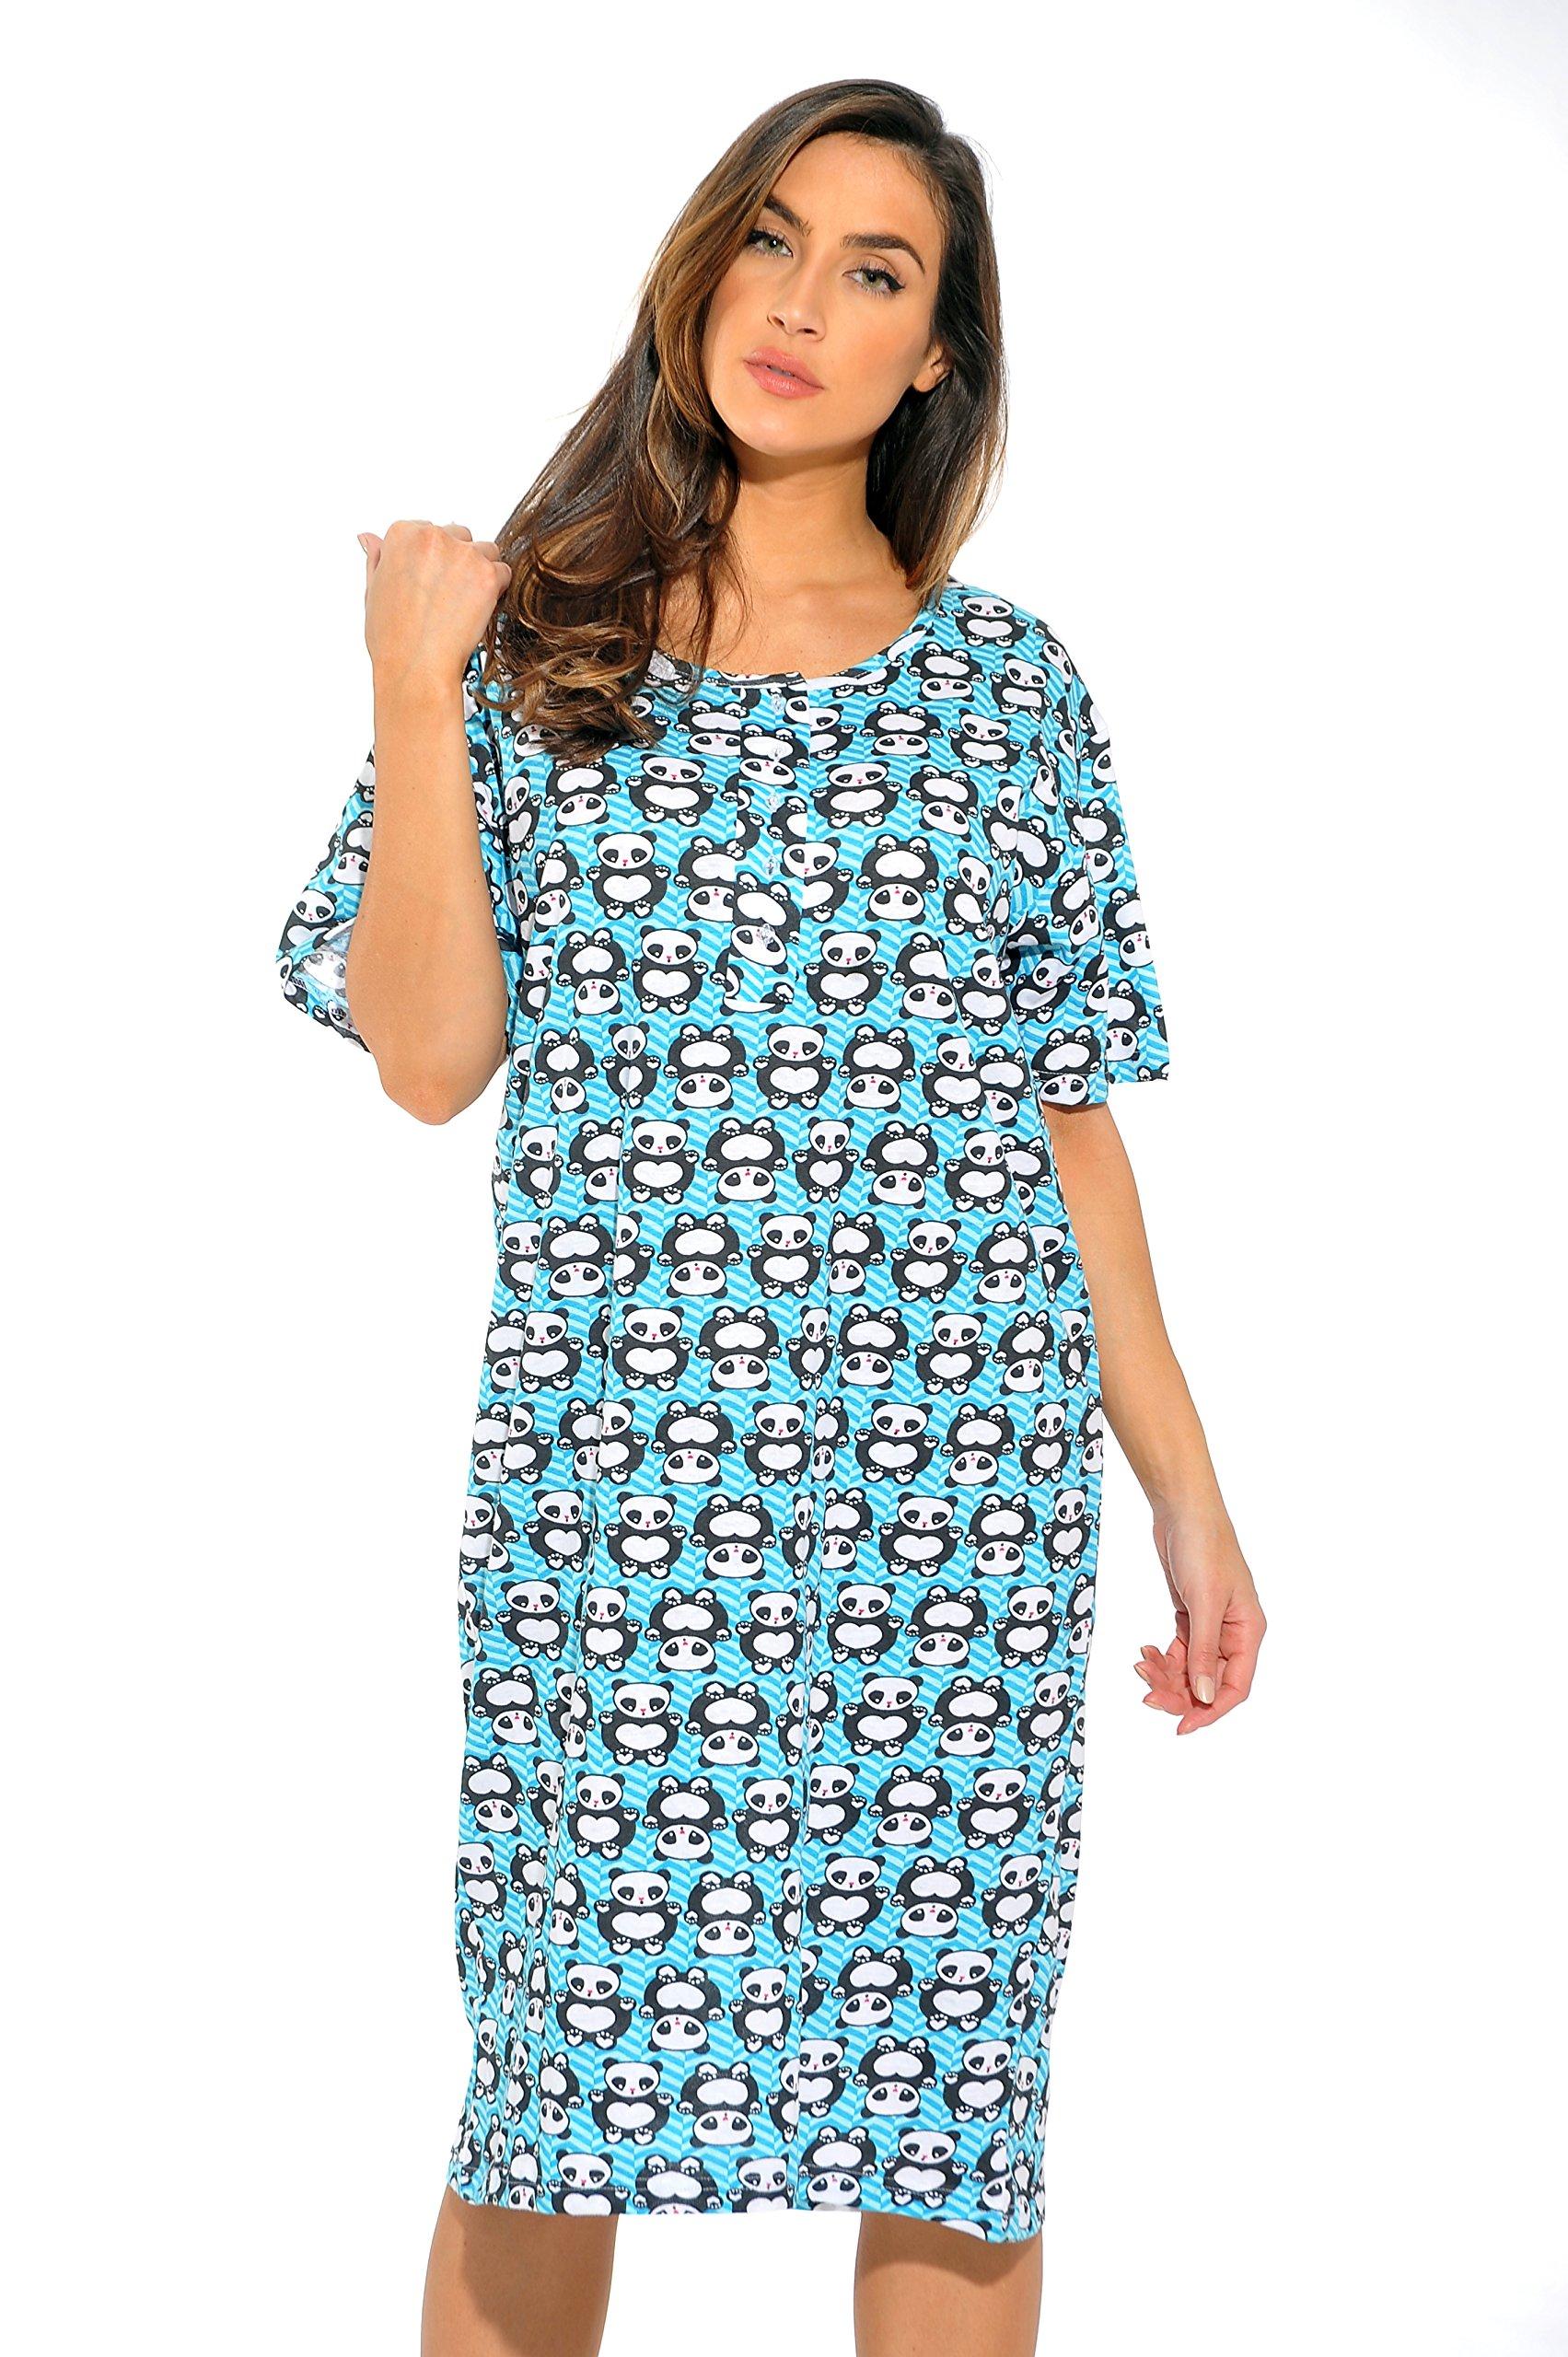 Just Love 4360-P-10067-S Short Sleeve Nightgown/Sleep Dress Women/Sleepwear